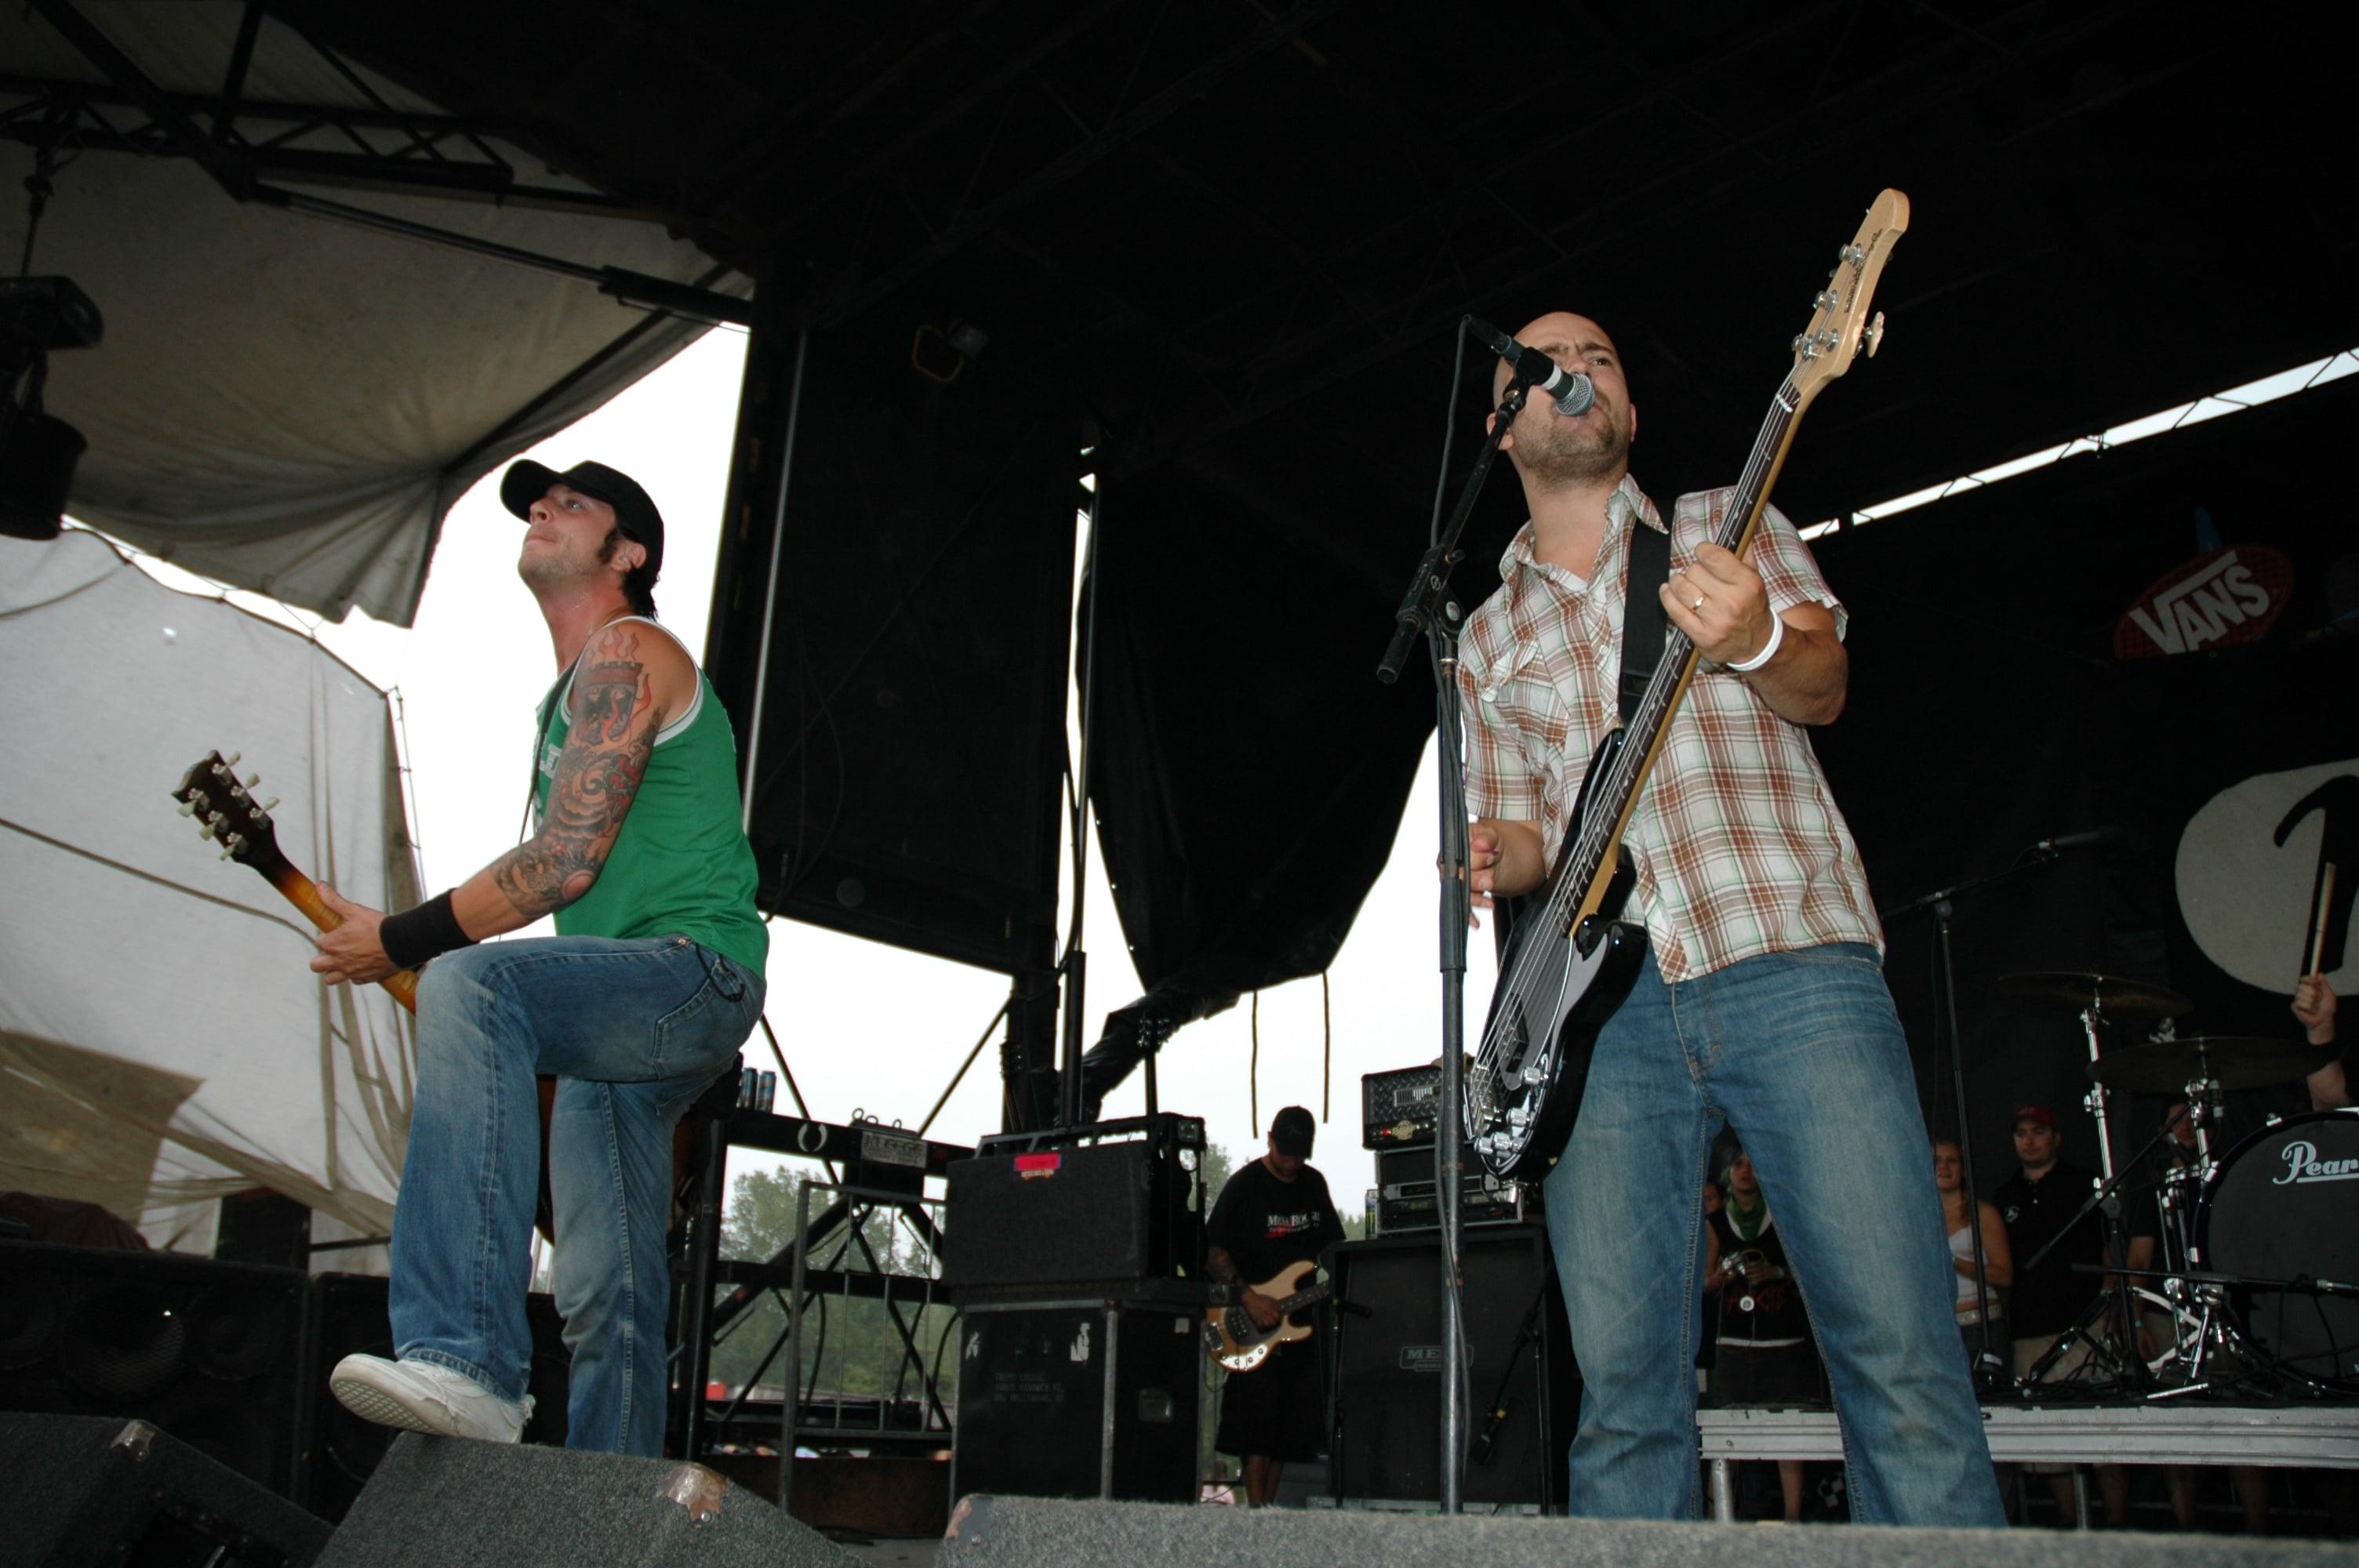 Millencolin @ Warped Tour 05, NYC - 8.12.05 (2)